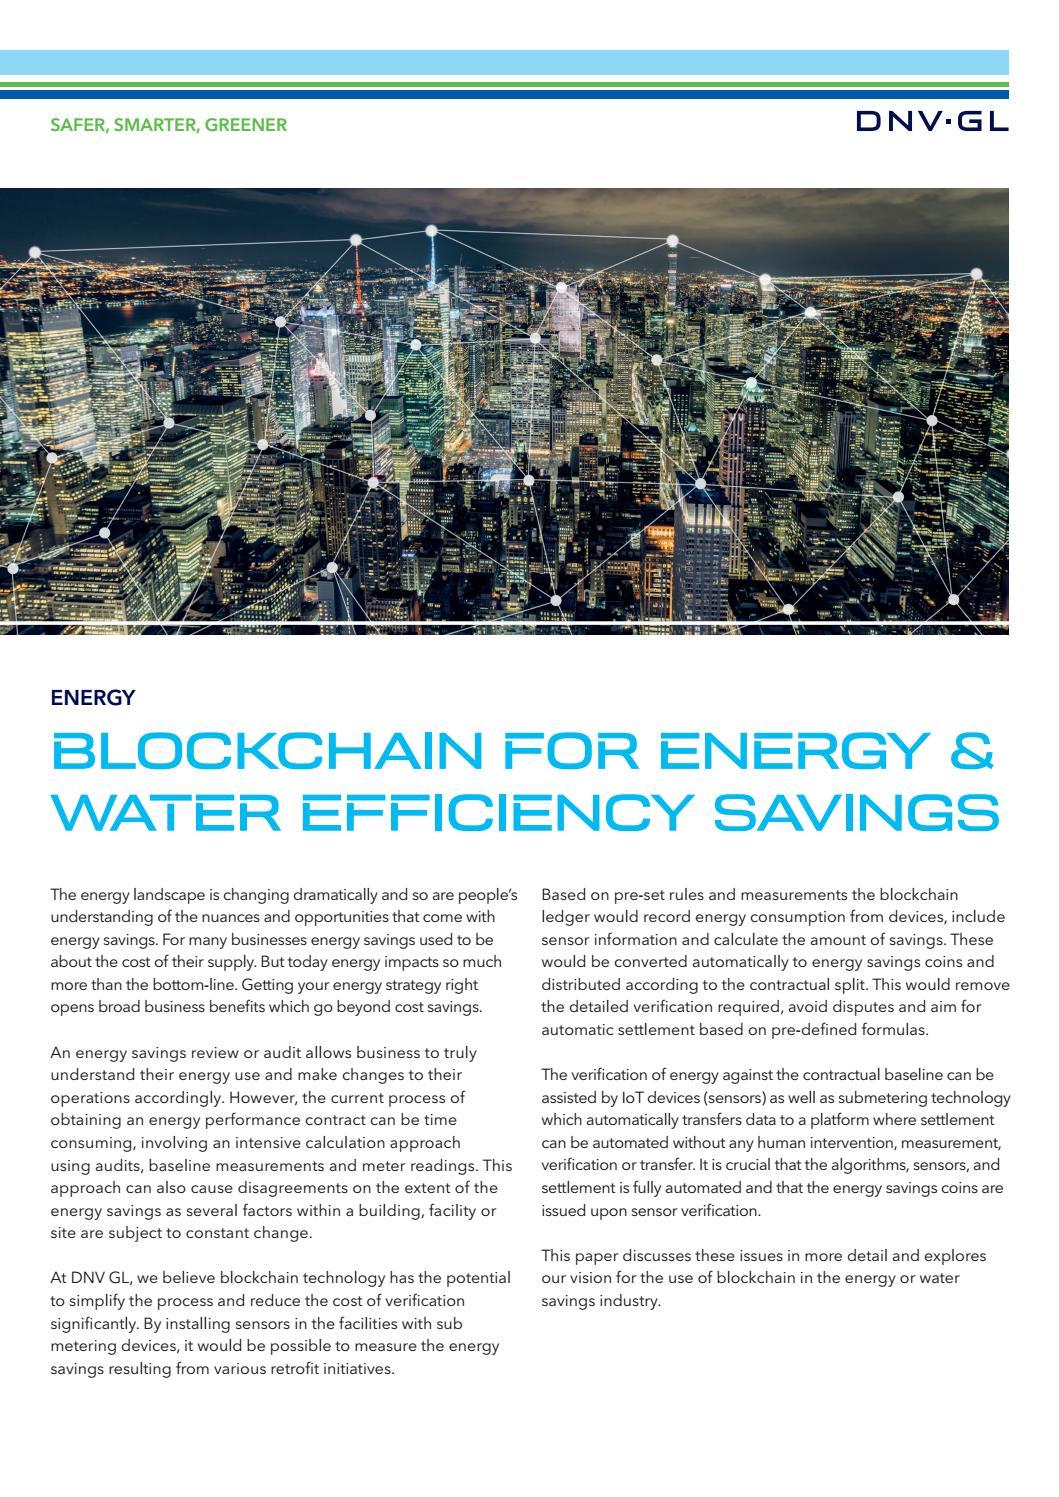 Blockchain for energy & water efficiency savings by DNV GL - issuu